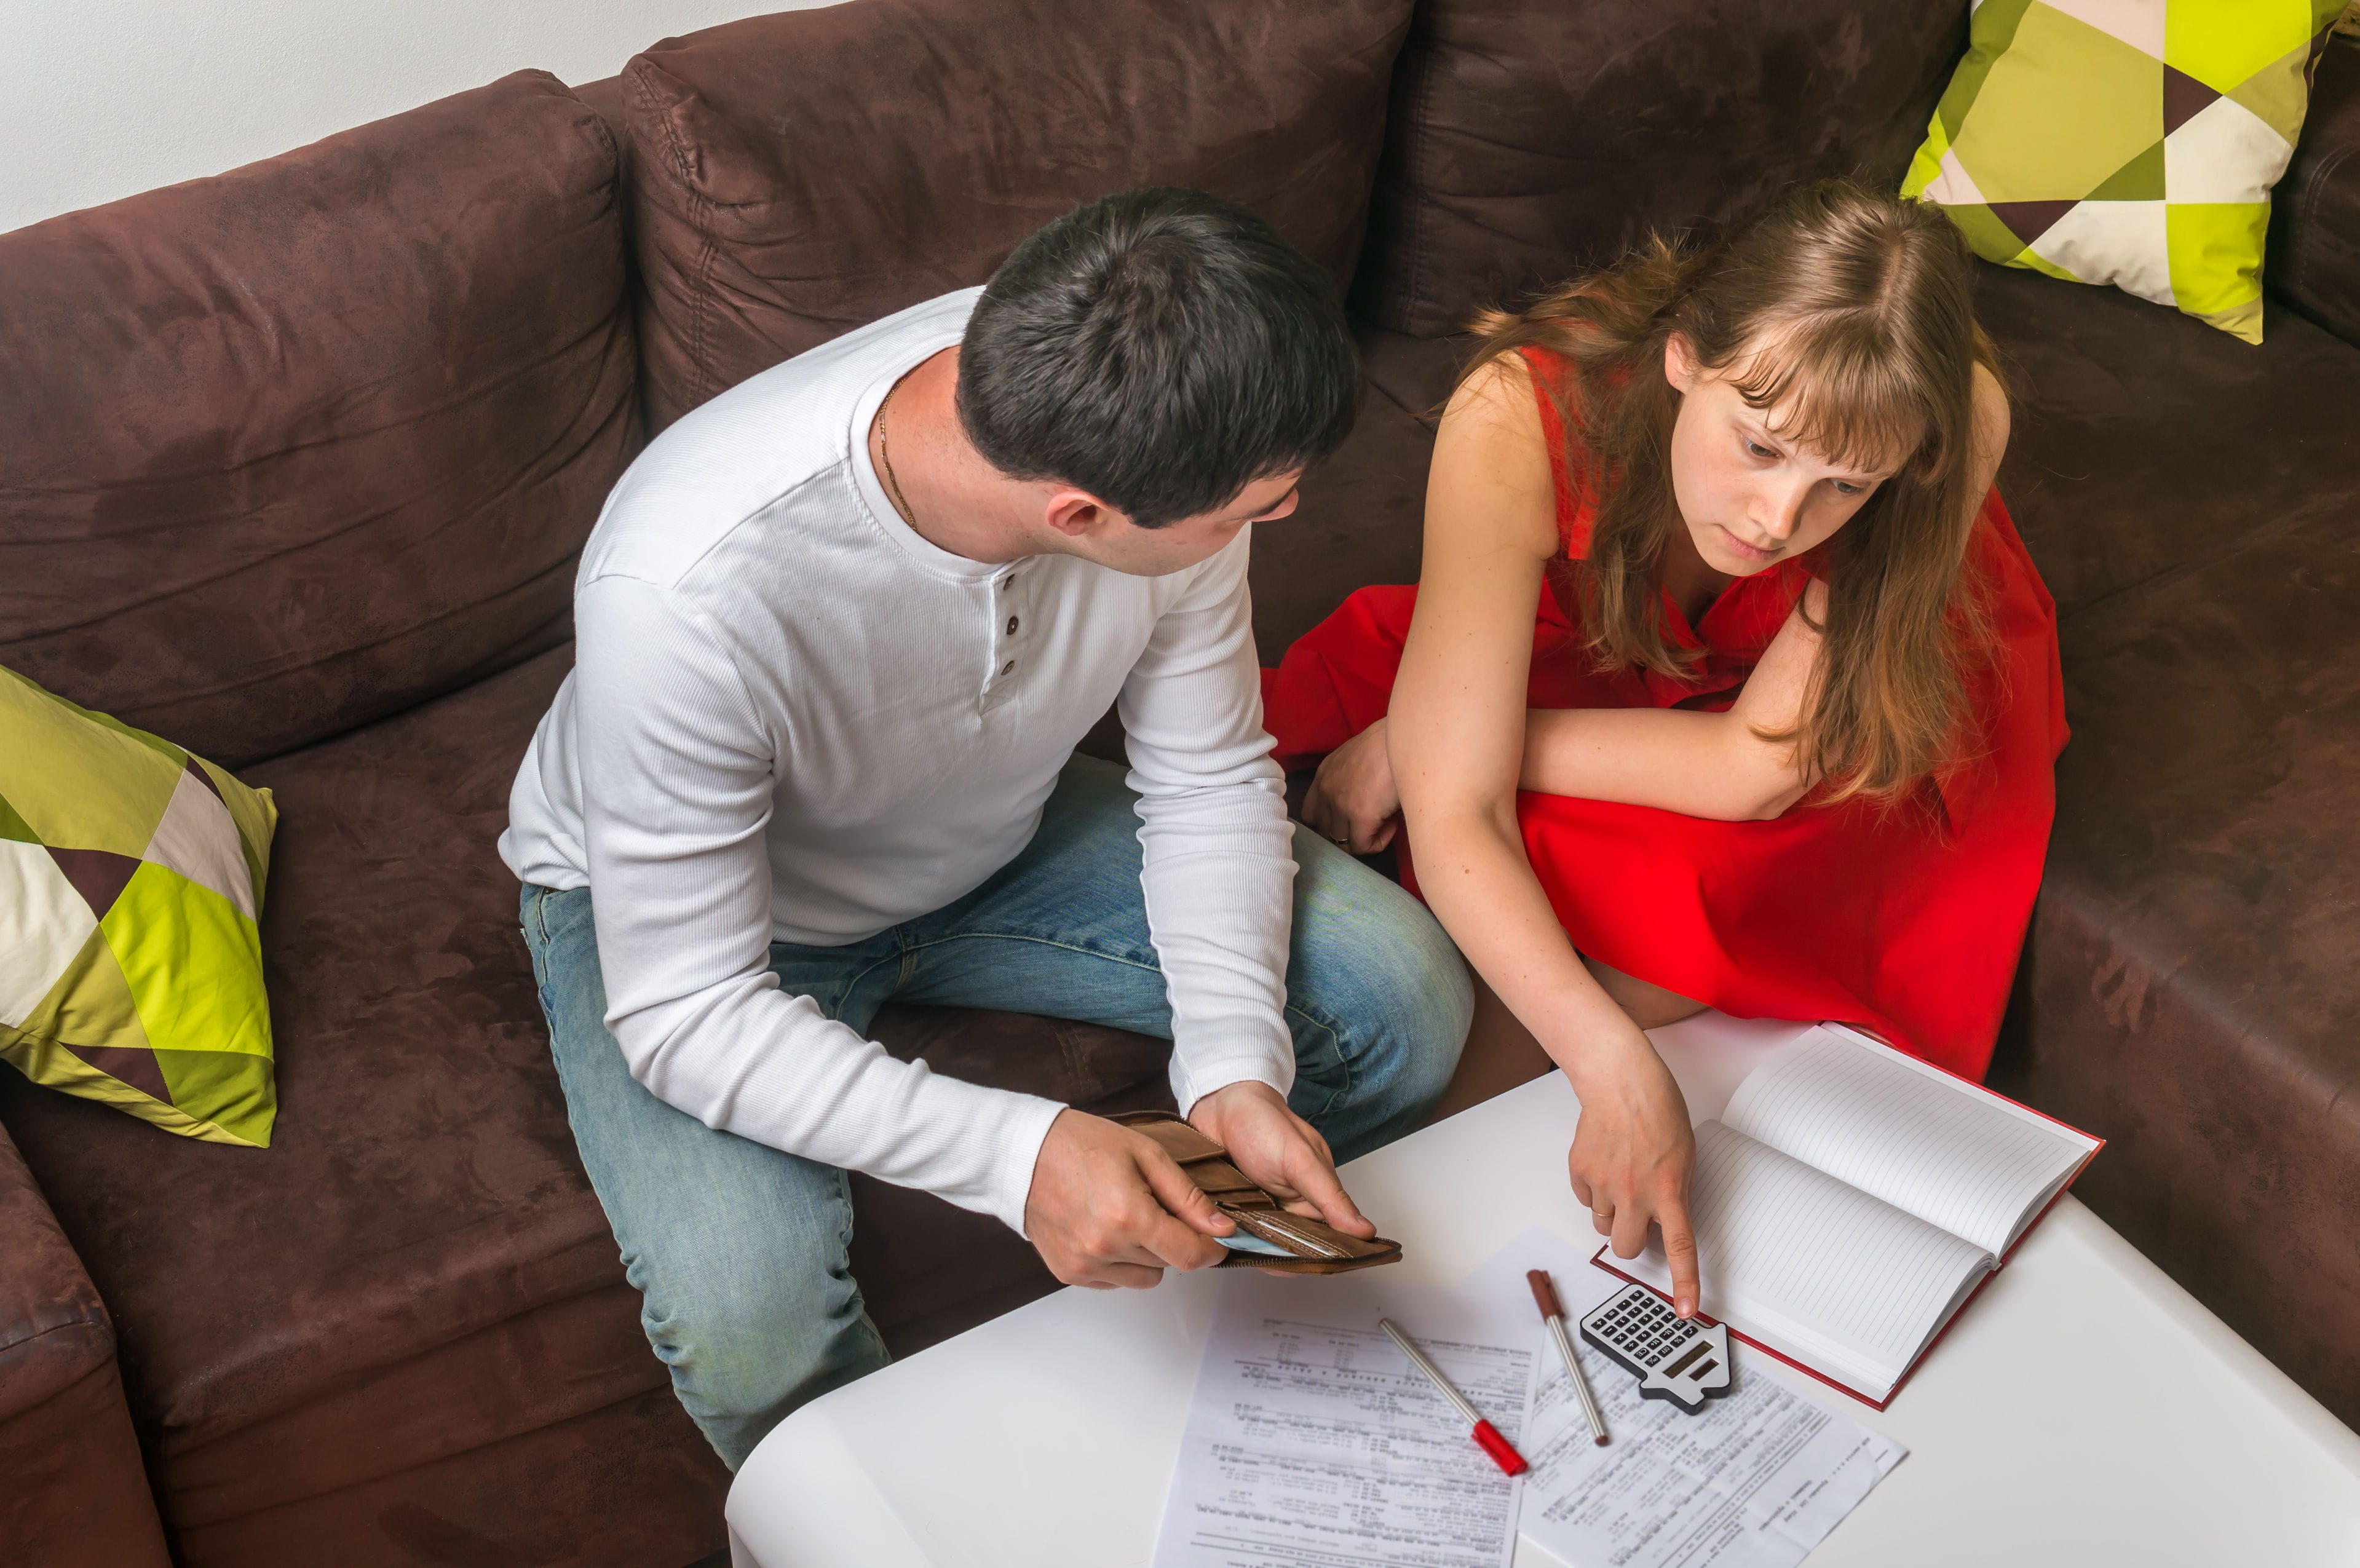 couple discussing building plans